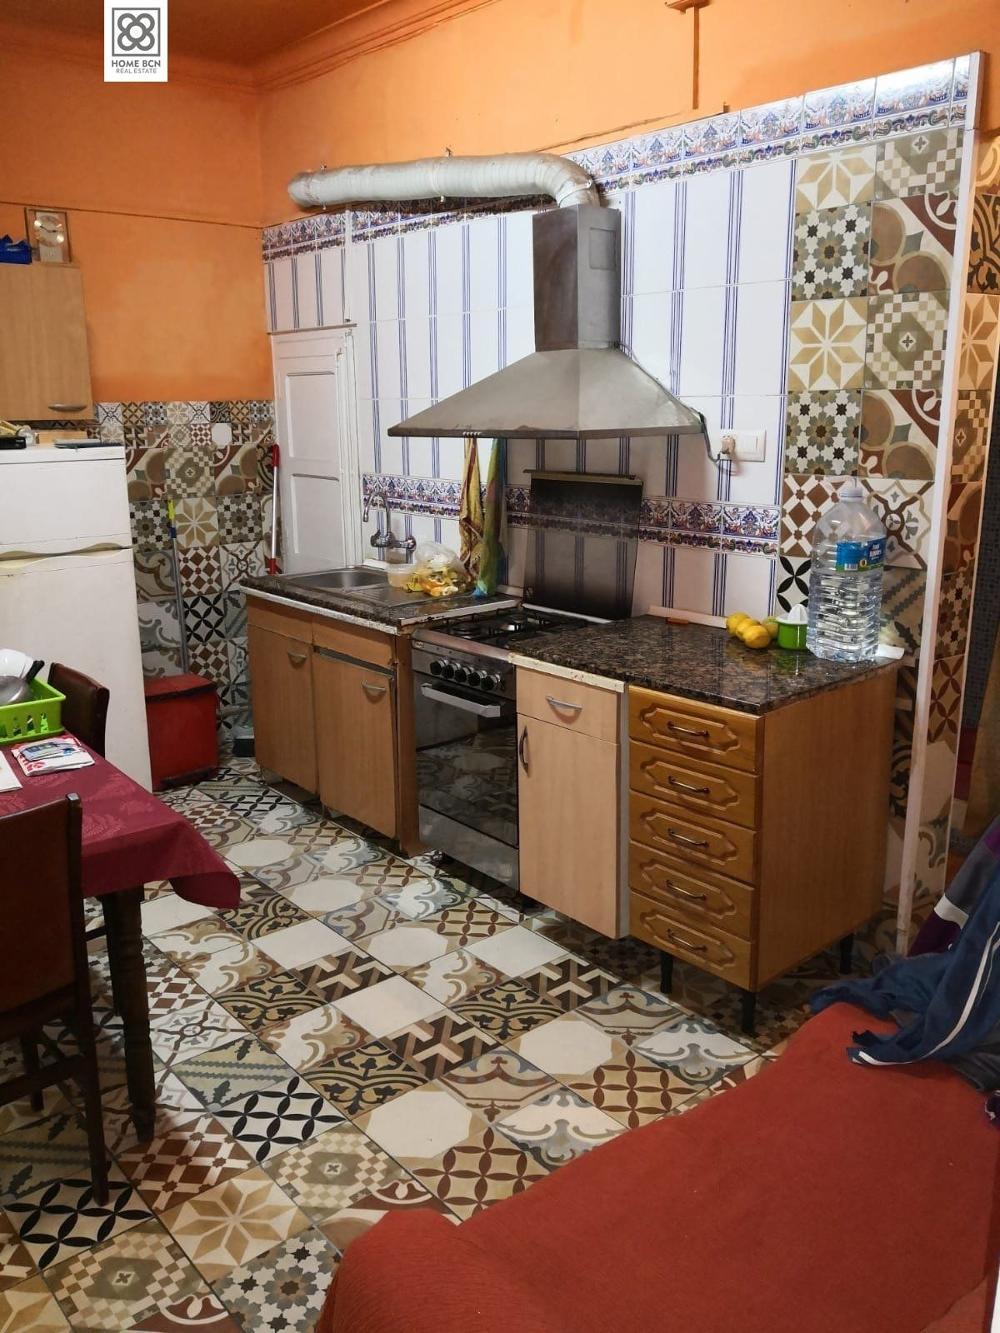 sants-montjuïc-poble sec barcelona appartement foto 3749144